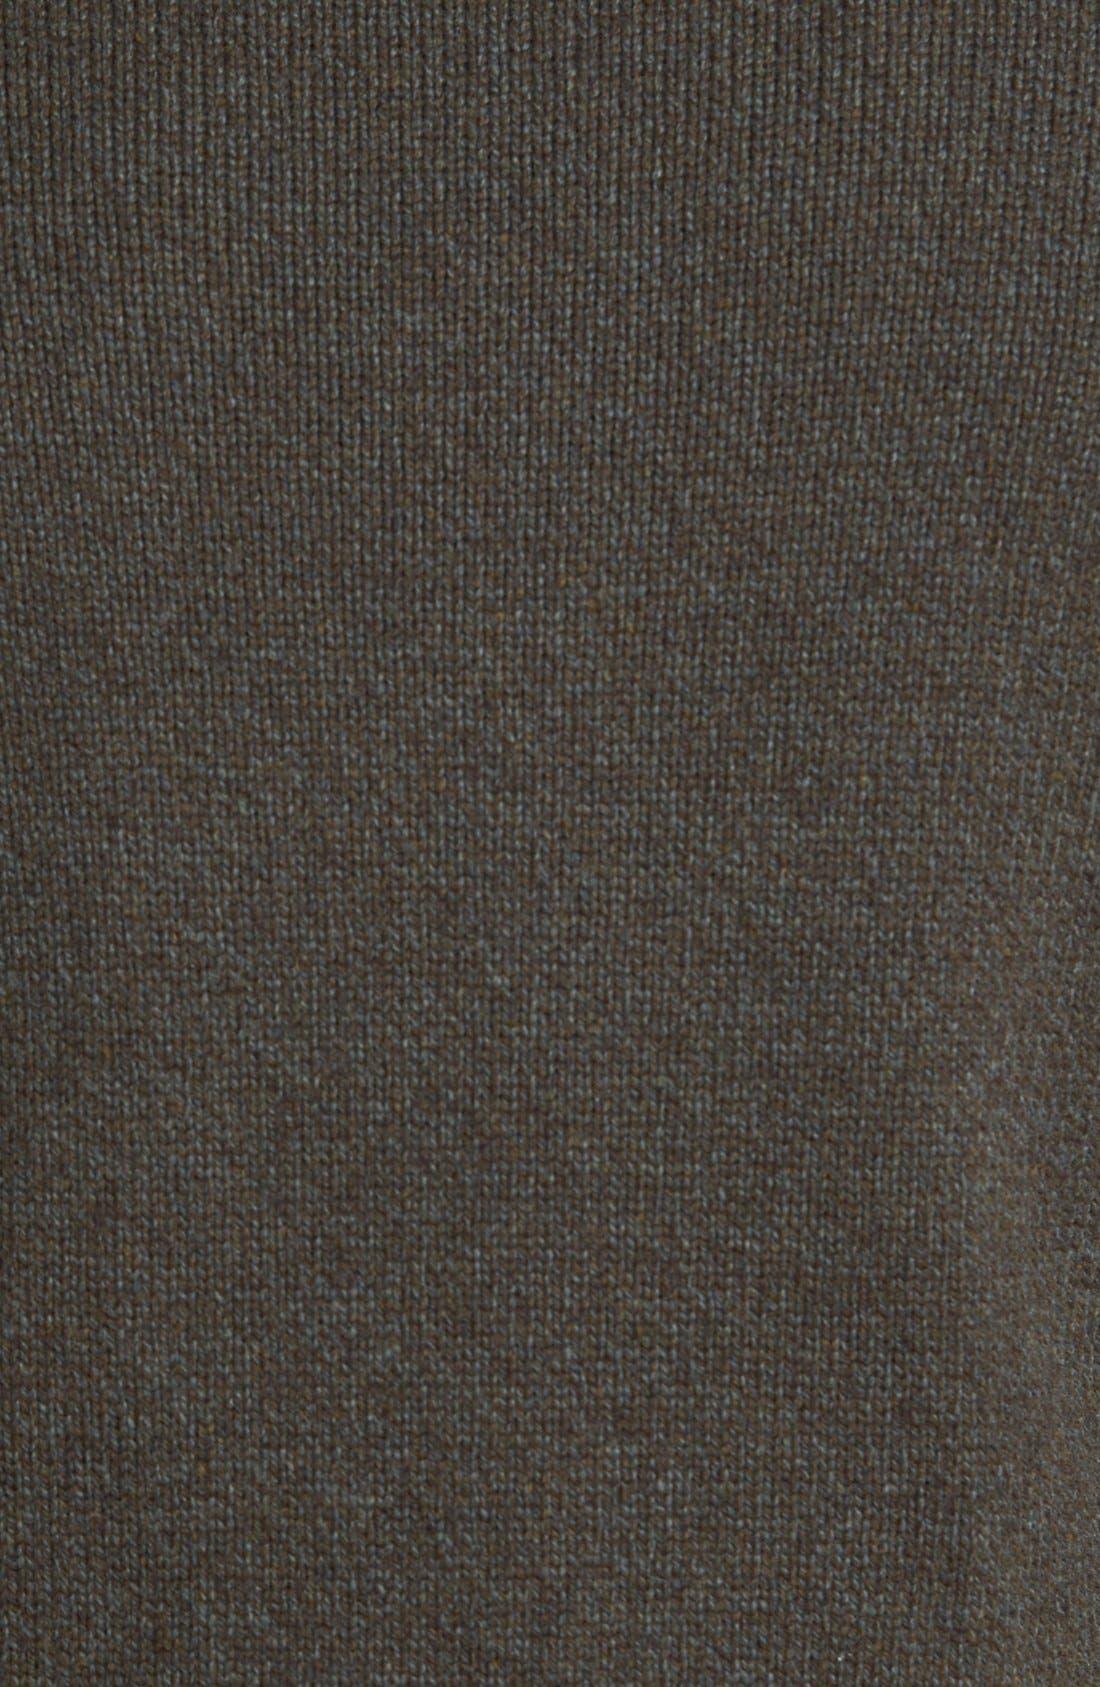 Alternate Image 3  - Rodd & Gunn 'Sumer' Cable Knit Sweater